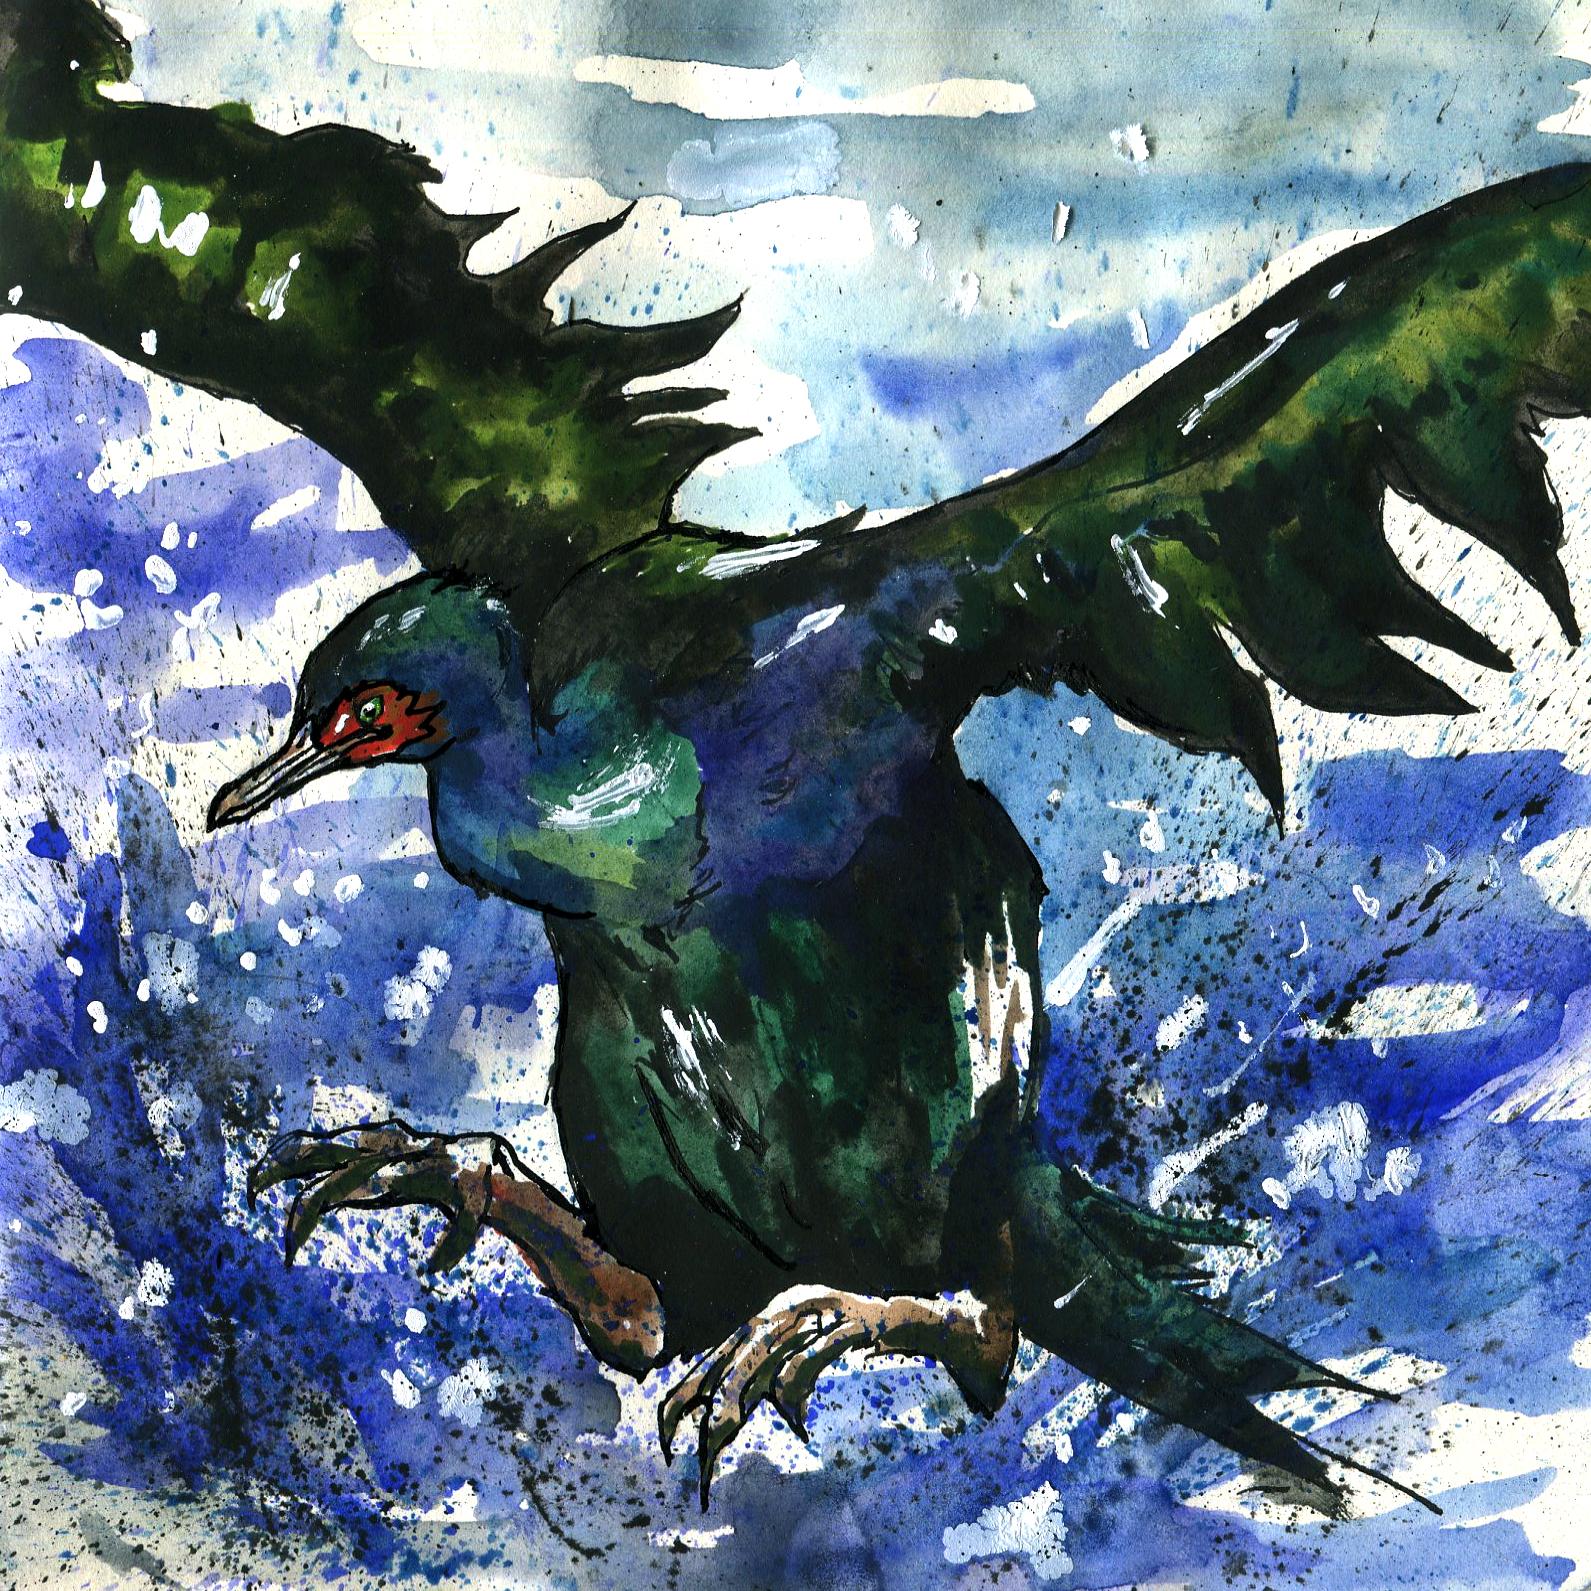 379. Pelagic Cormorant